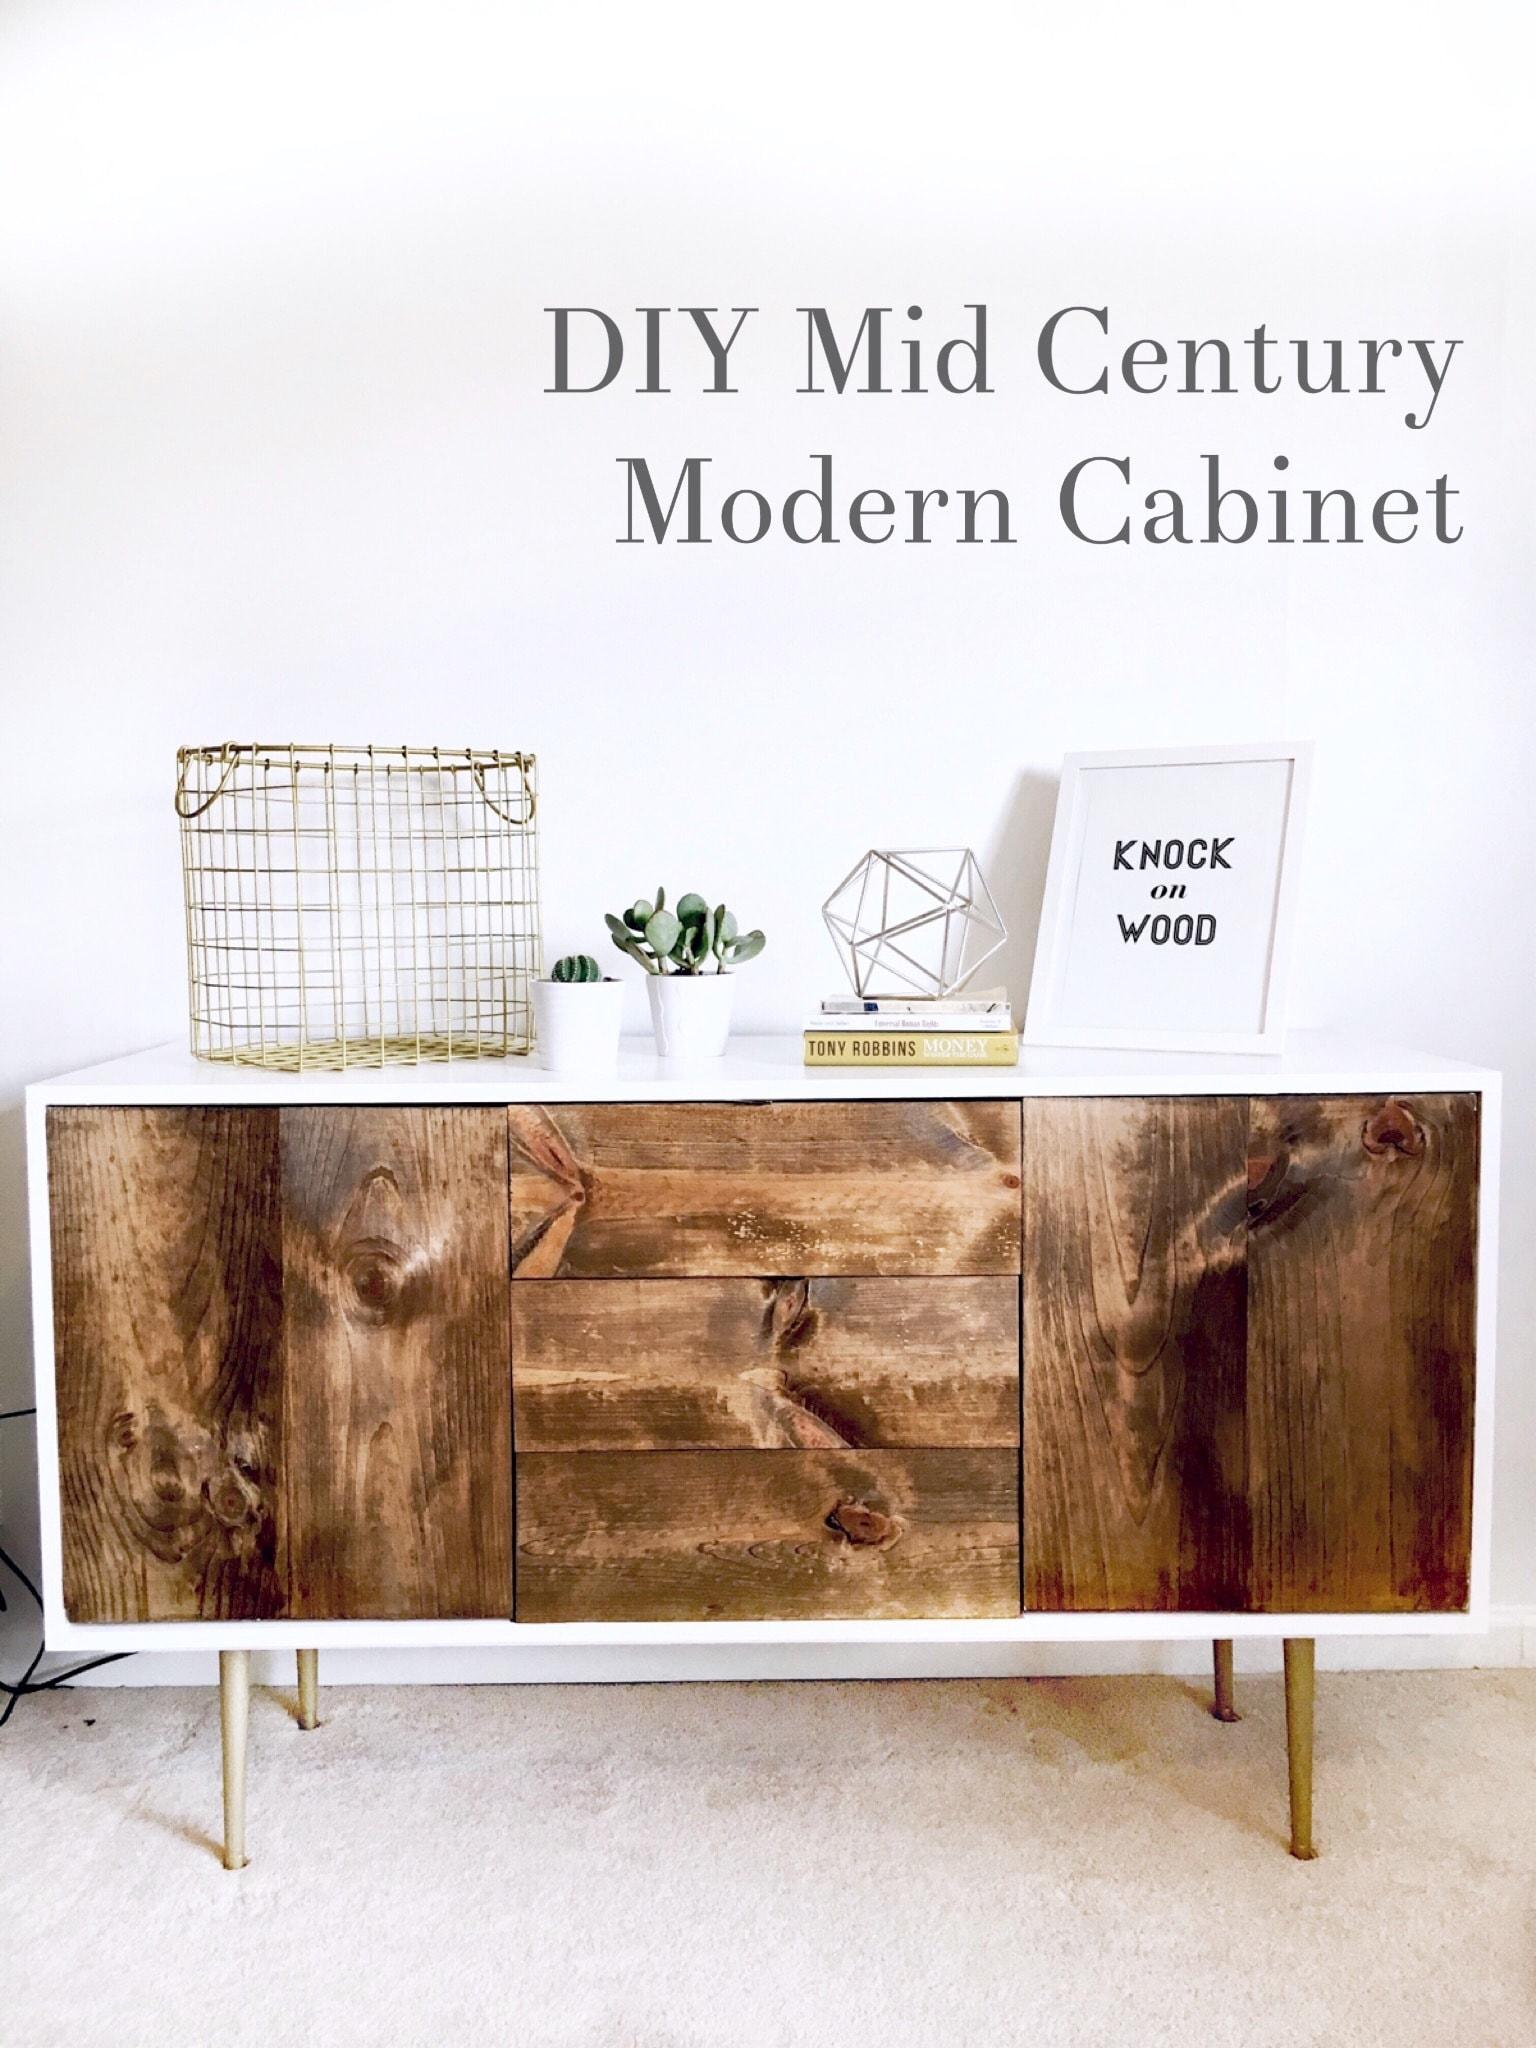 DIY Organic Modernism Inspired Cabinet under $250